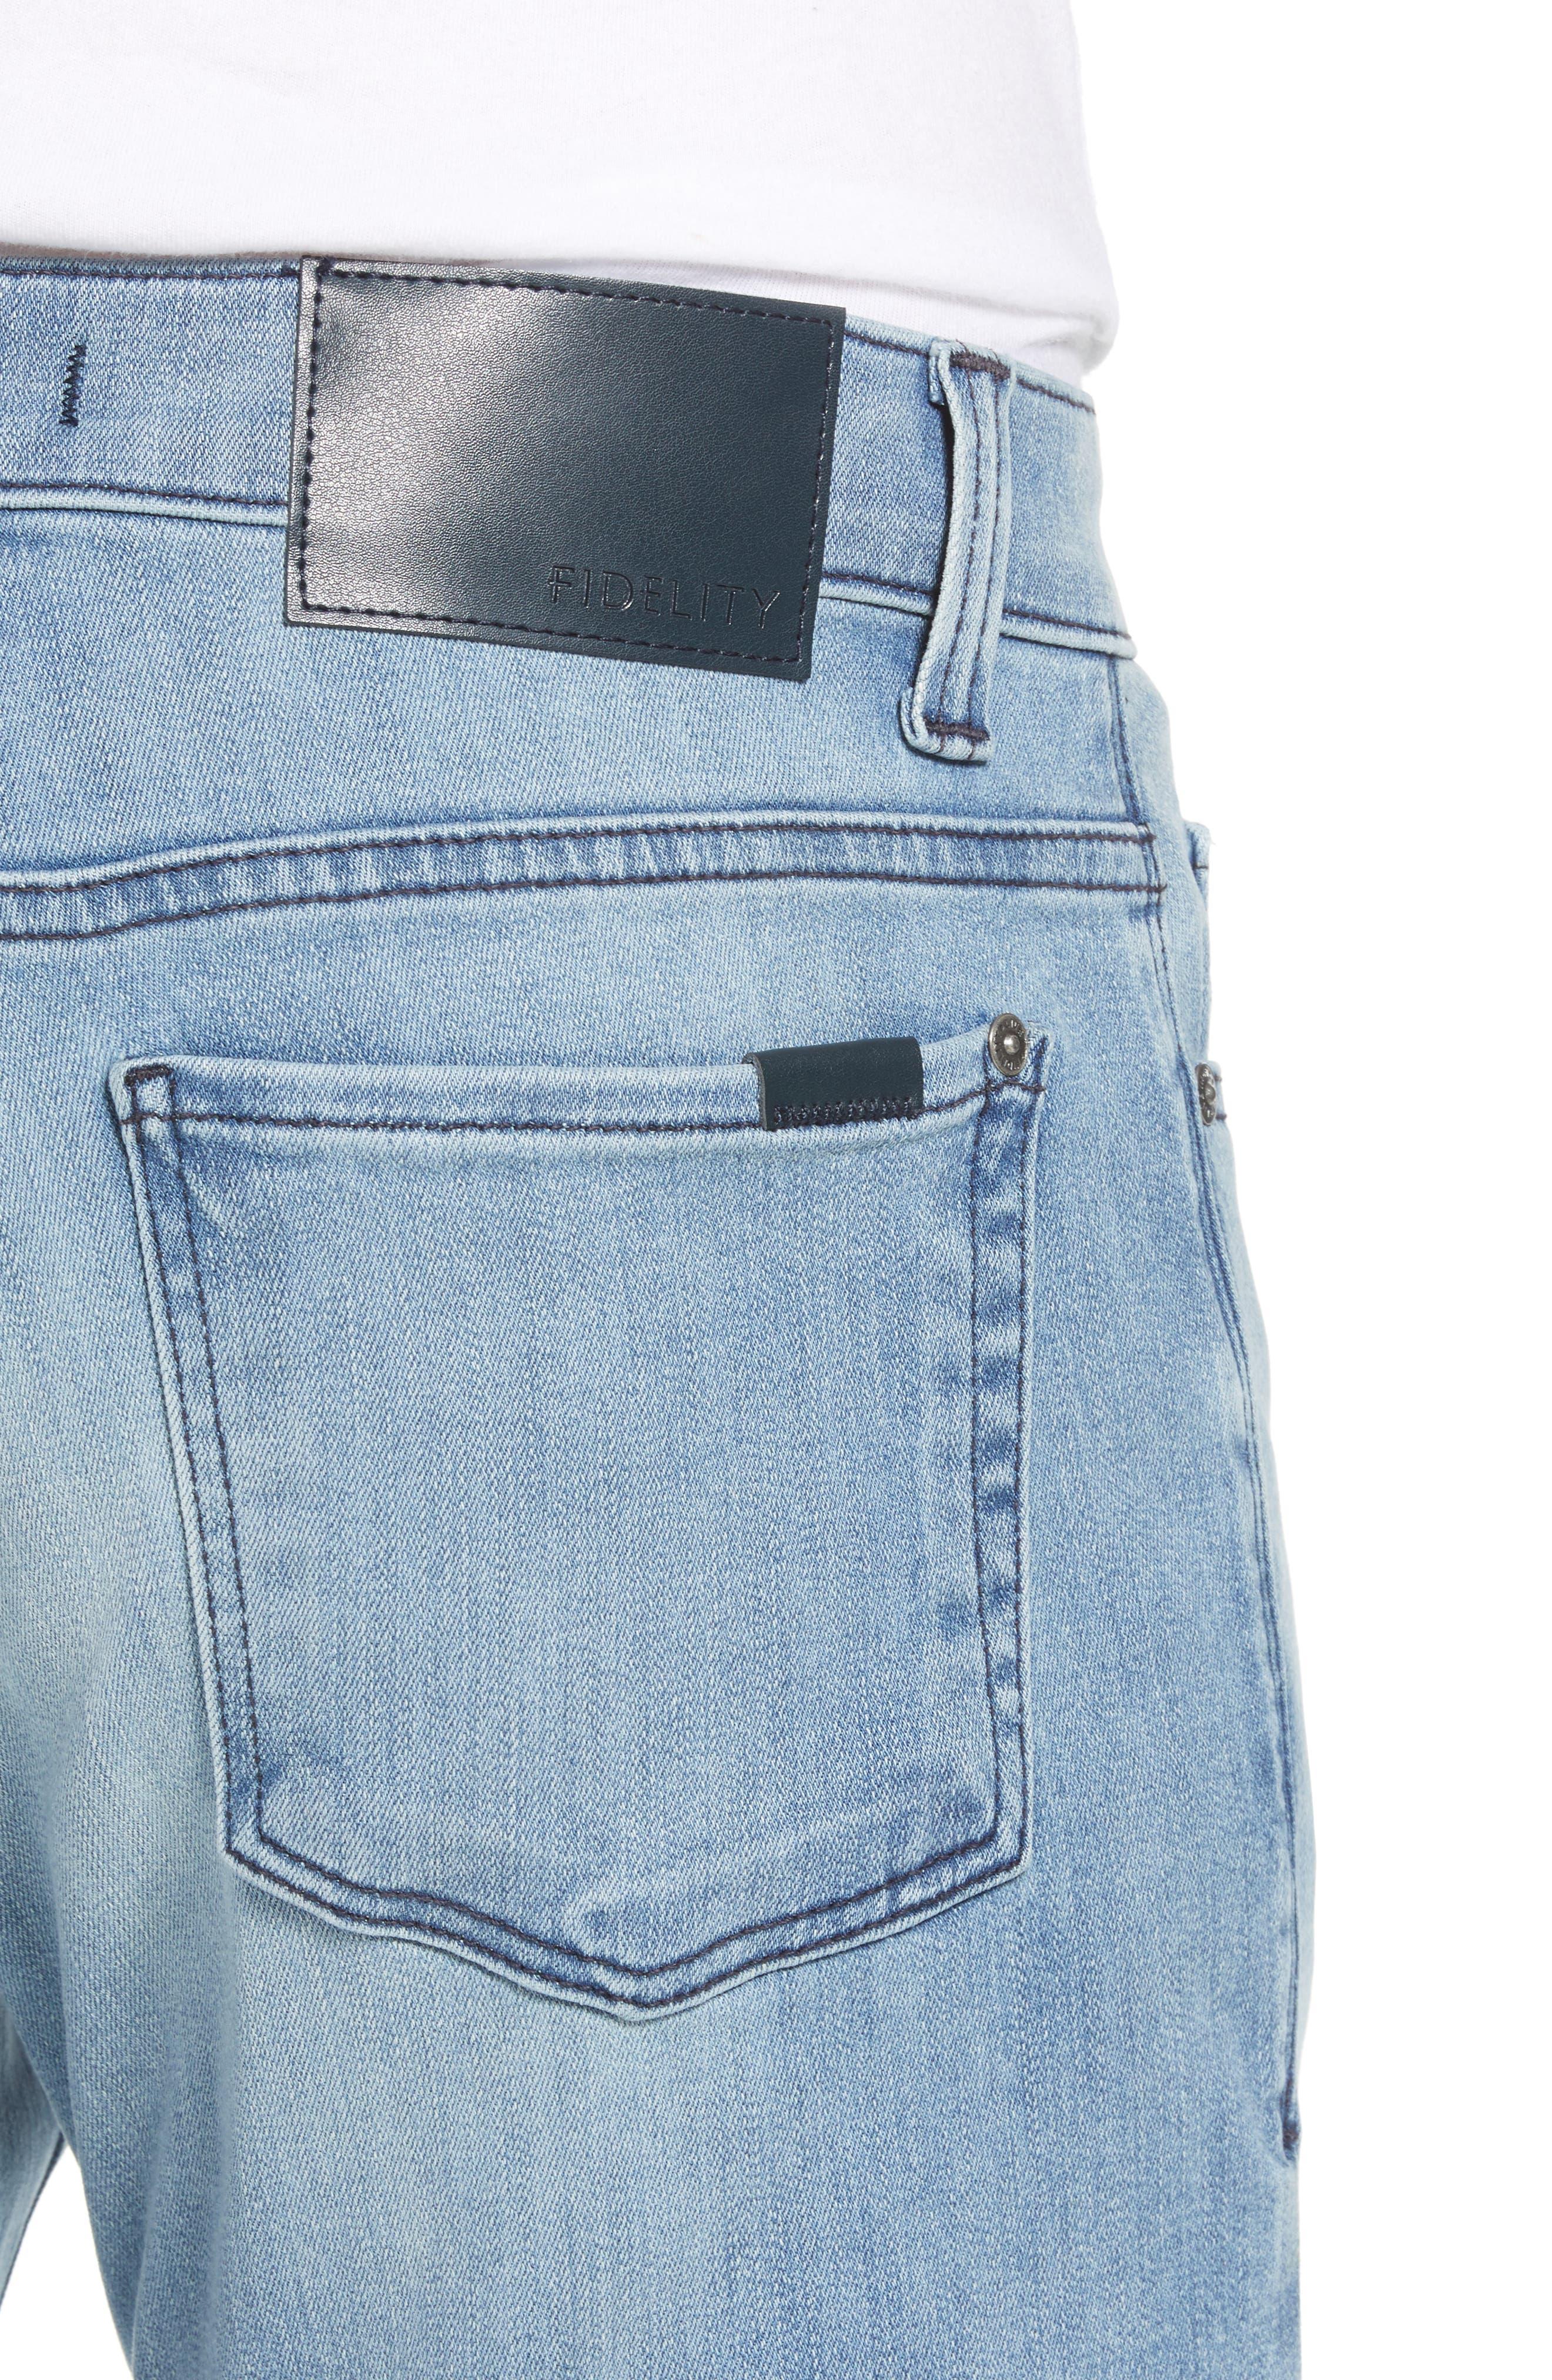 Jimmy Slim Straight Leg Jeans,                             Alternate thumbnail 4, color,                             Abbey Blue